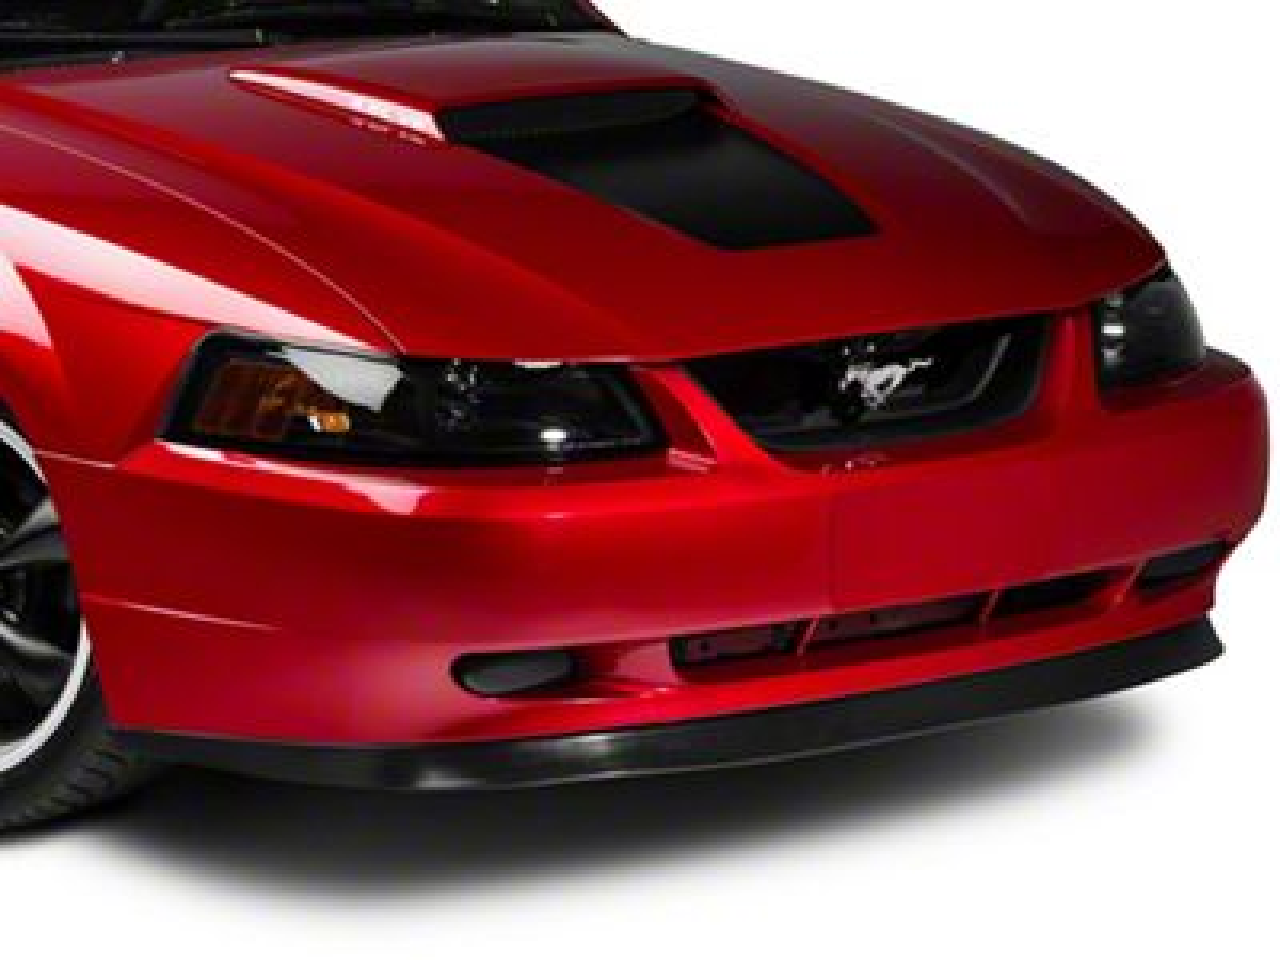 SpeedForm Mach 1 Chin Spoiler (99-04 GT, V6; 99-01 Cobra)